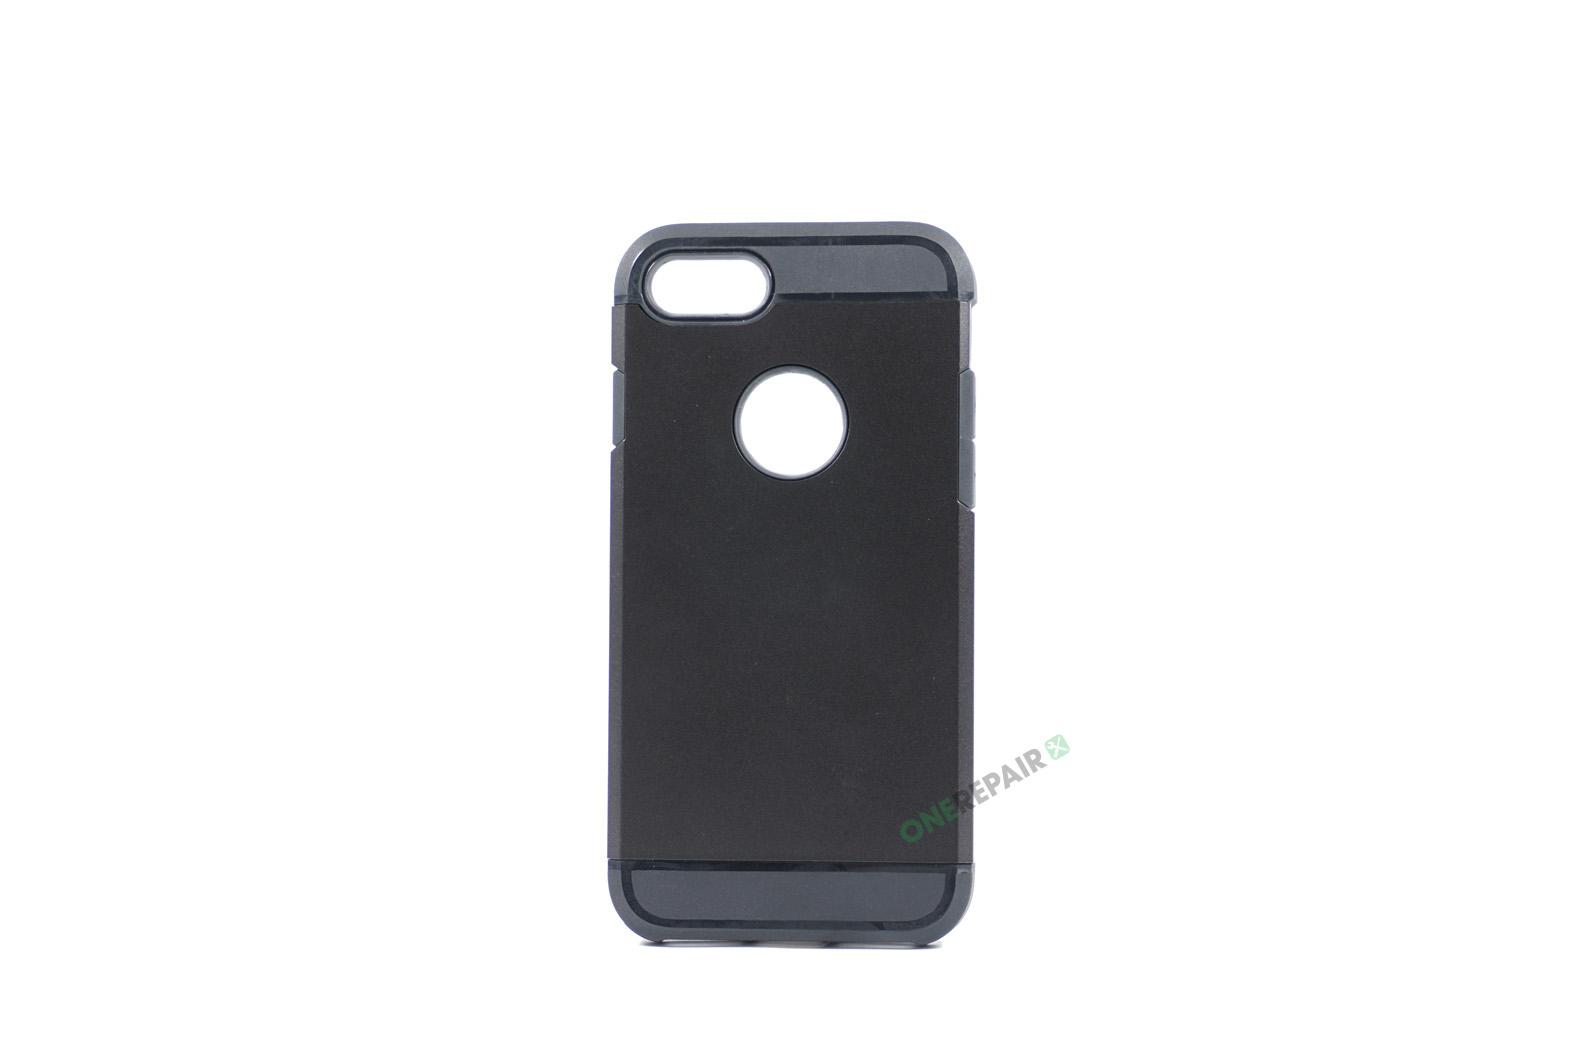 350770_iPhone_7_8_Armorcover_Hardcase_Cover_Sort_OneRepair_WM_00001